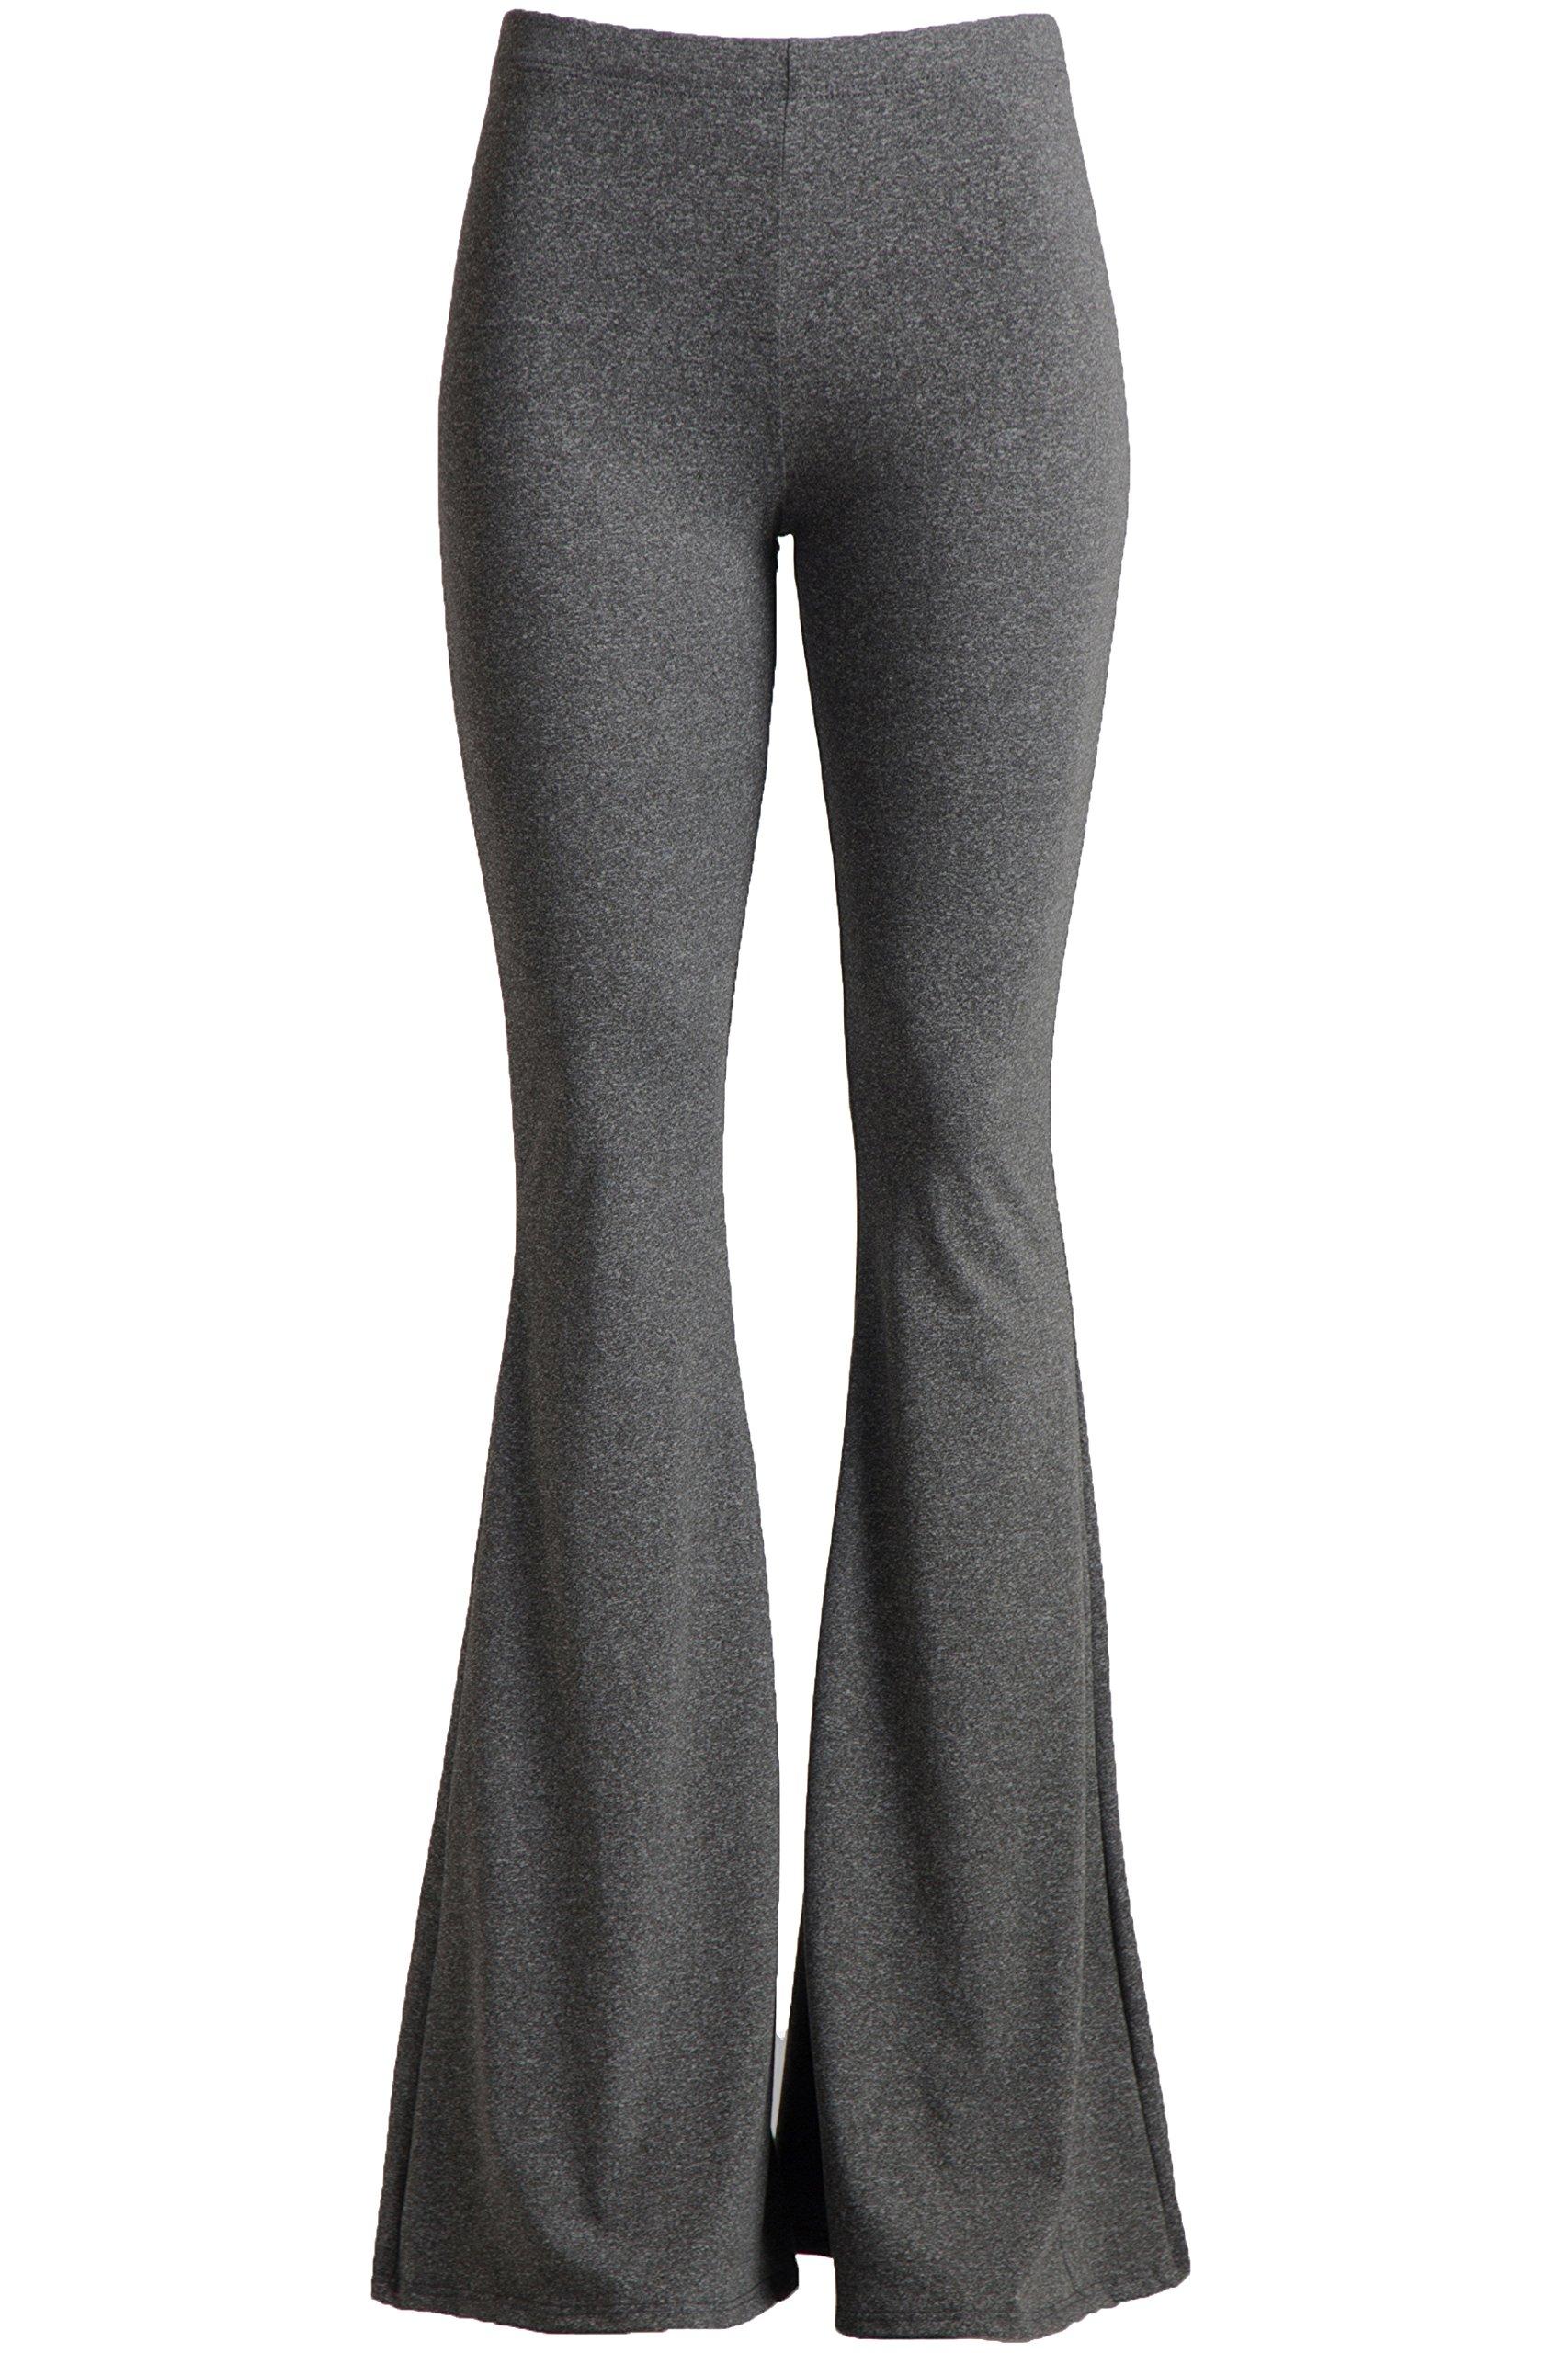 Fashionomics Womens Boho Comfy Stretchy Bell Bottom Flare Pants (S, H Charcoal)